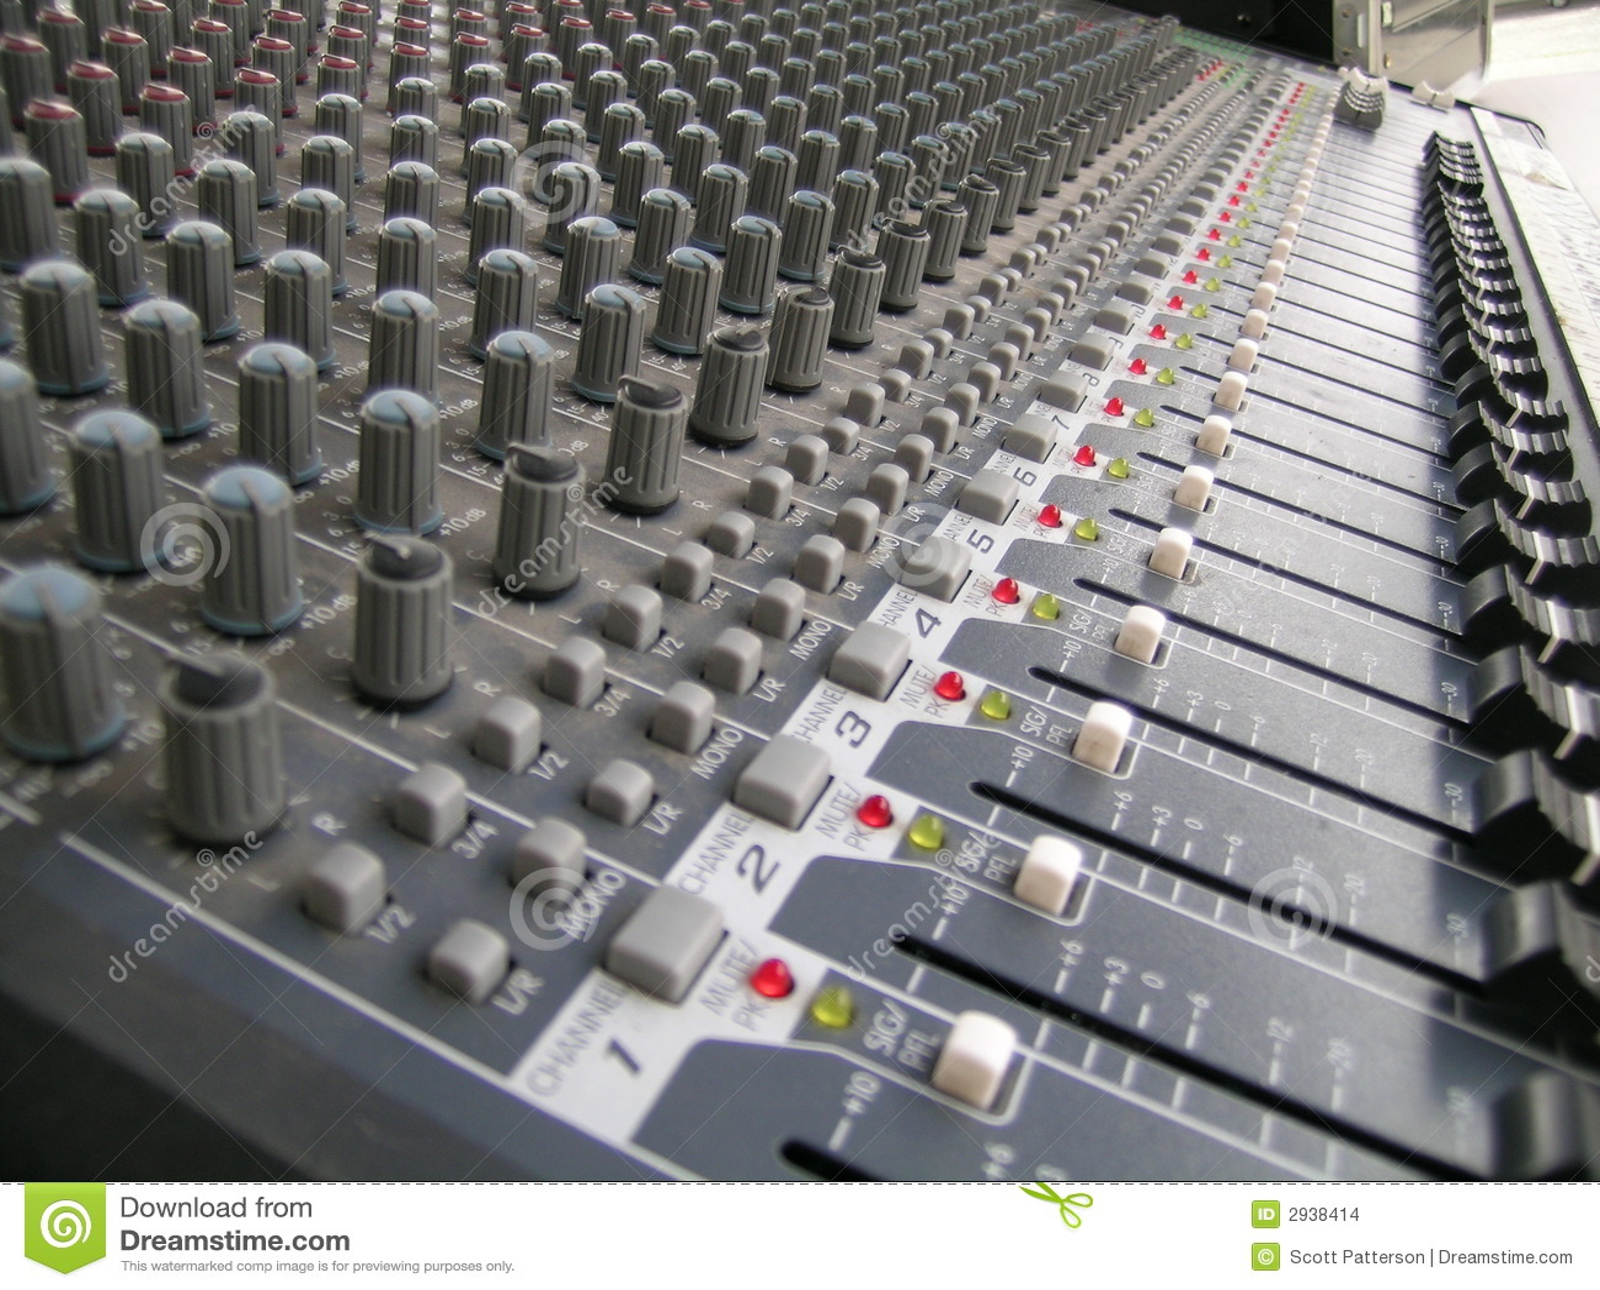 basic dj mixing techniques pdf